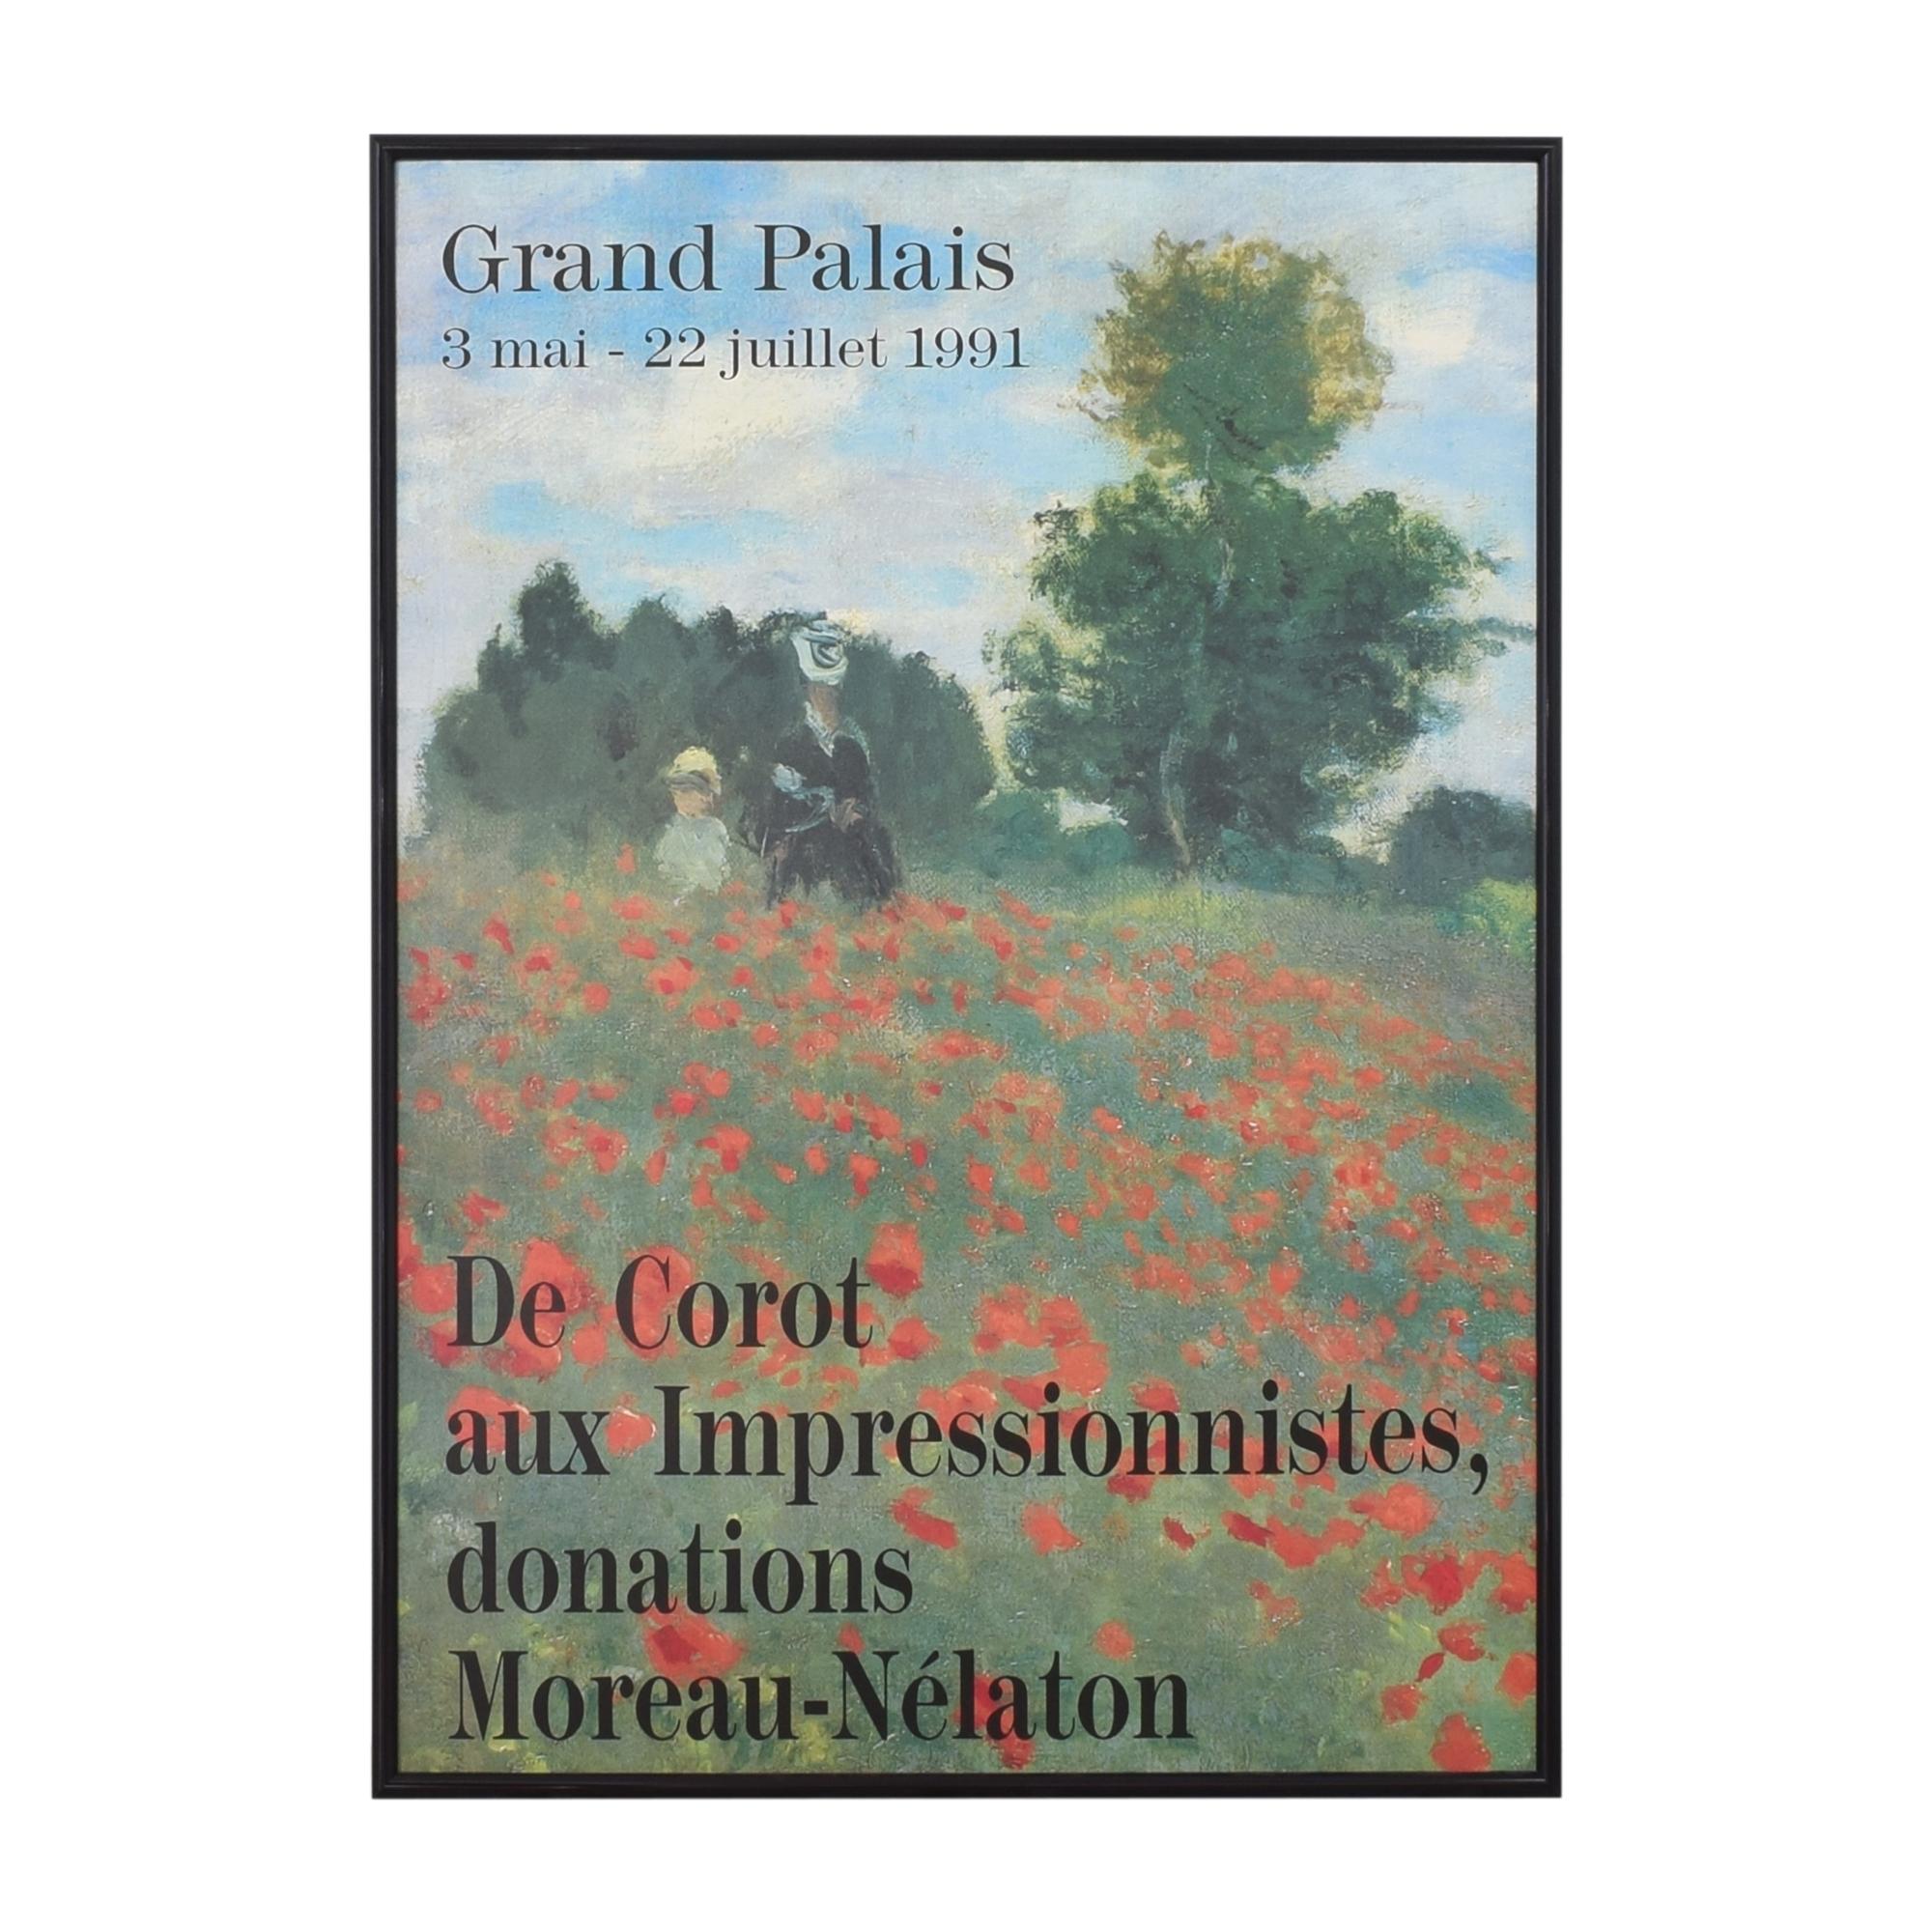 Grand Palais Impressionist Art Exhibit Poster price